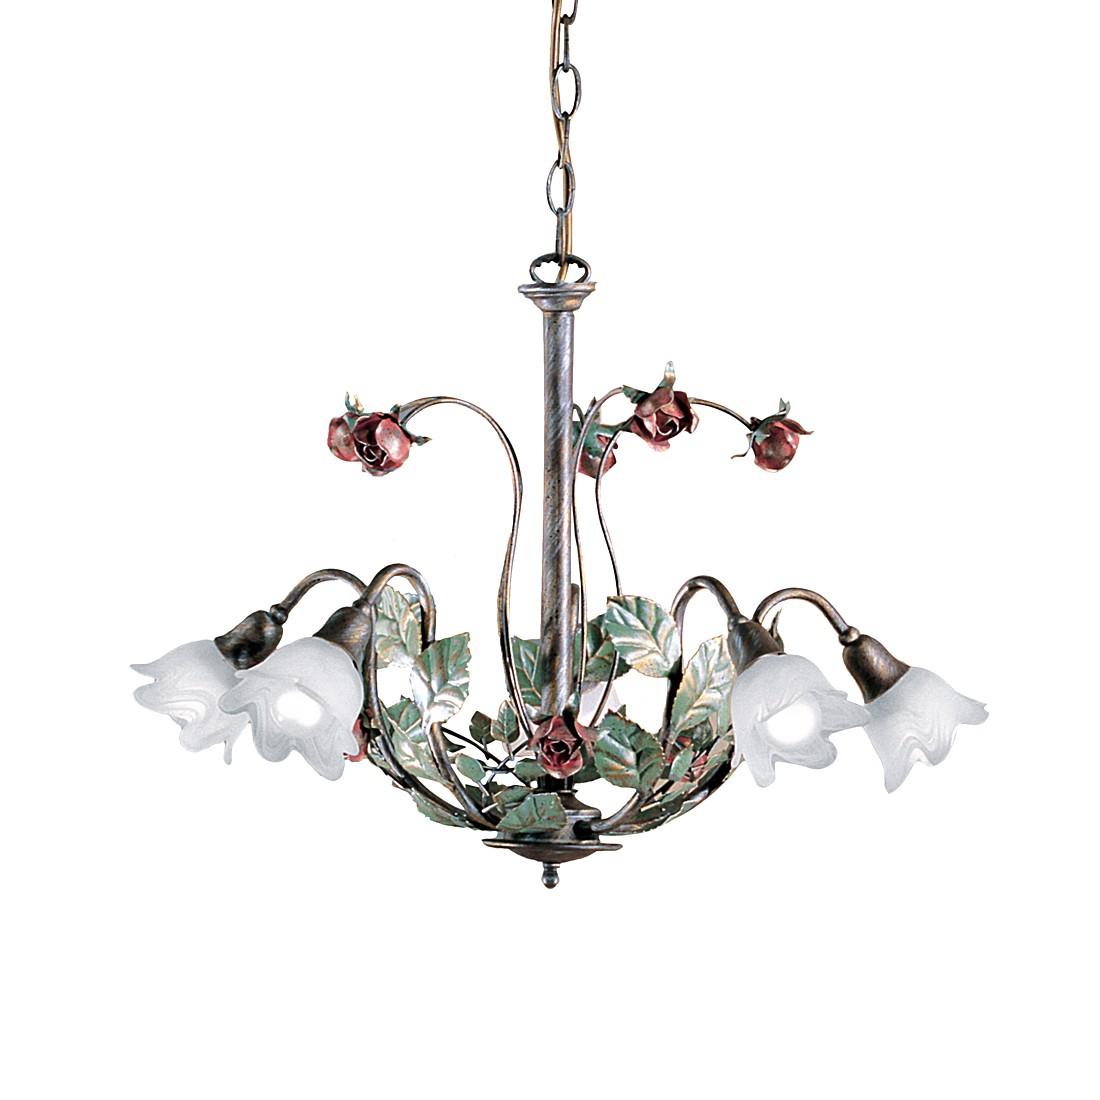 pendelleuchte rosaio metall glas bronze wei 5 flammig hans k gl a g nstig online kaufen. Black Bedroom Furniture Sets. Home Design Ideas